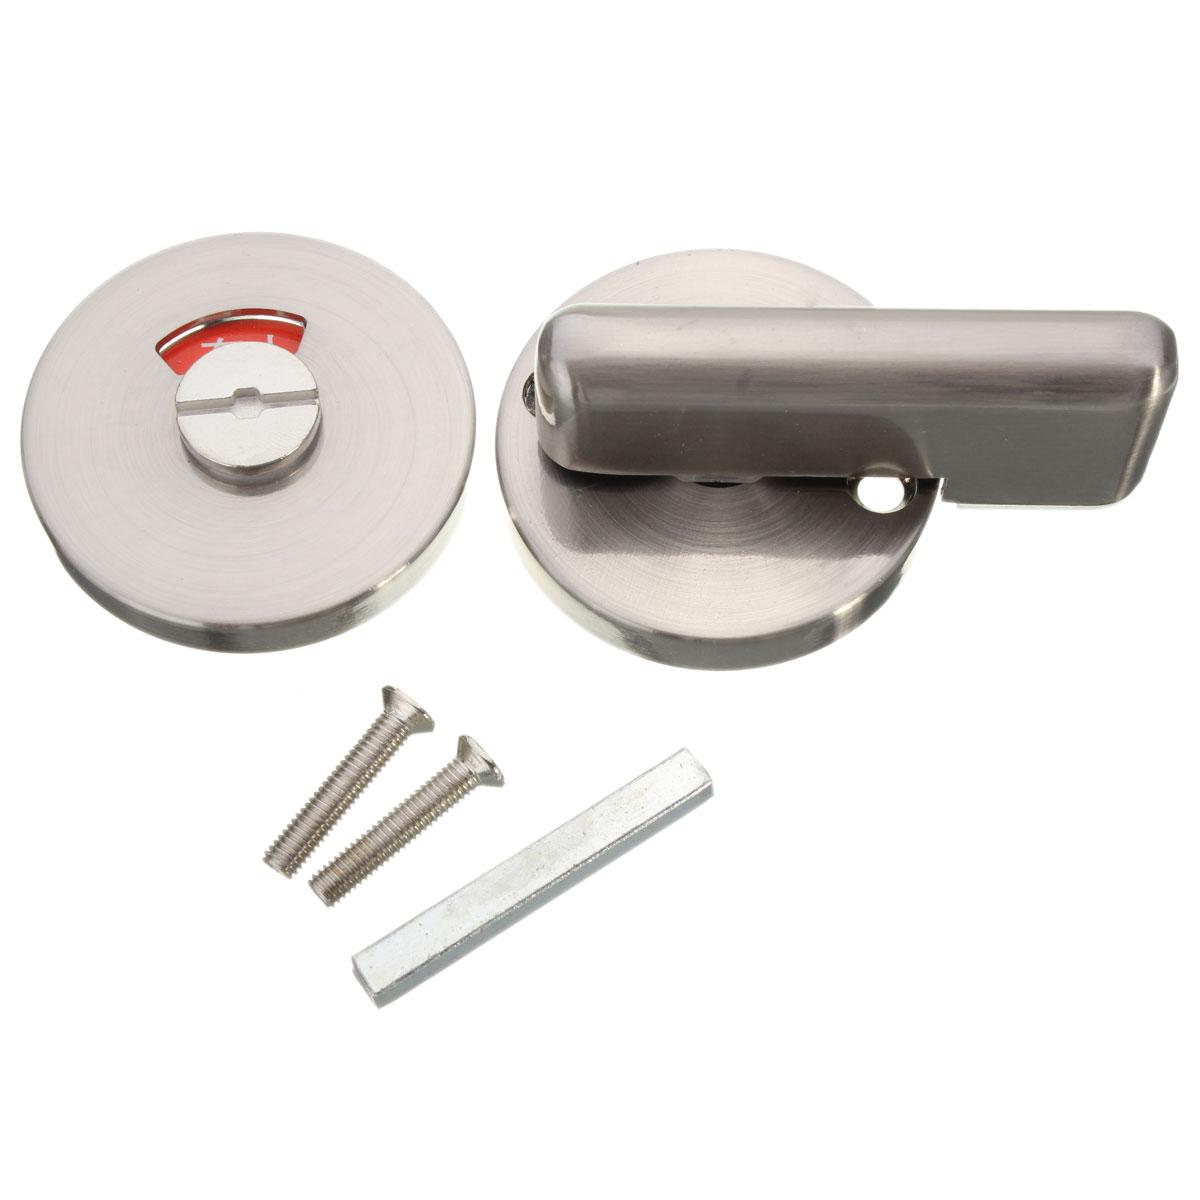 Bathroom Indicator Bolt Disabled Facility Toilet Door Lock Furniture Handle Tool Lazada Indonesia